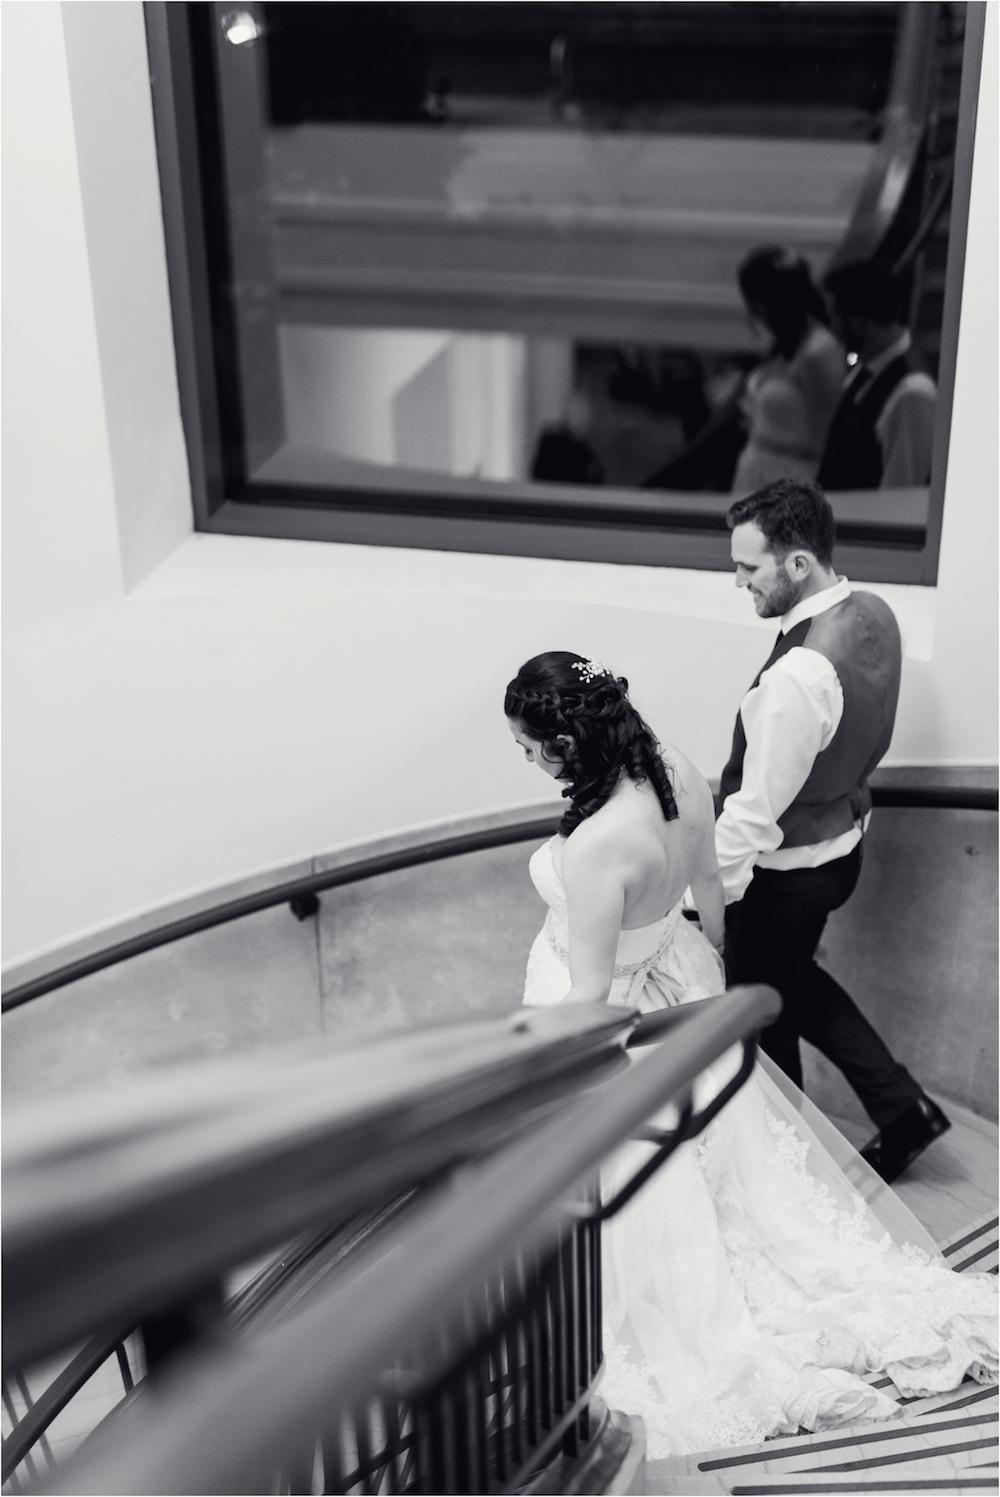 university-of-michigan-museum-art-ann-arbor-umma-wedding-photo-381.jpg